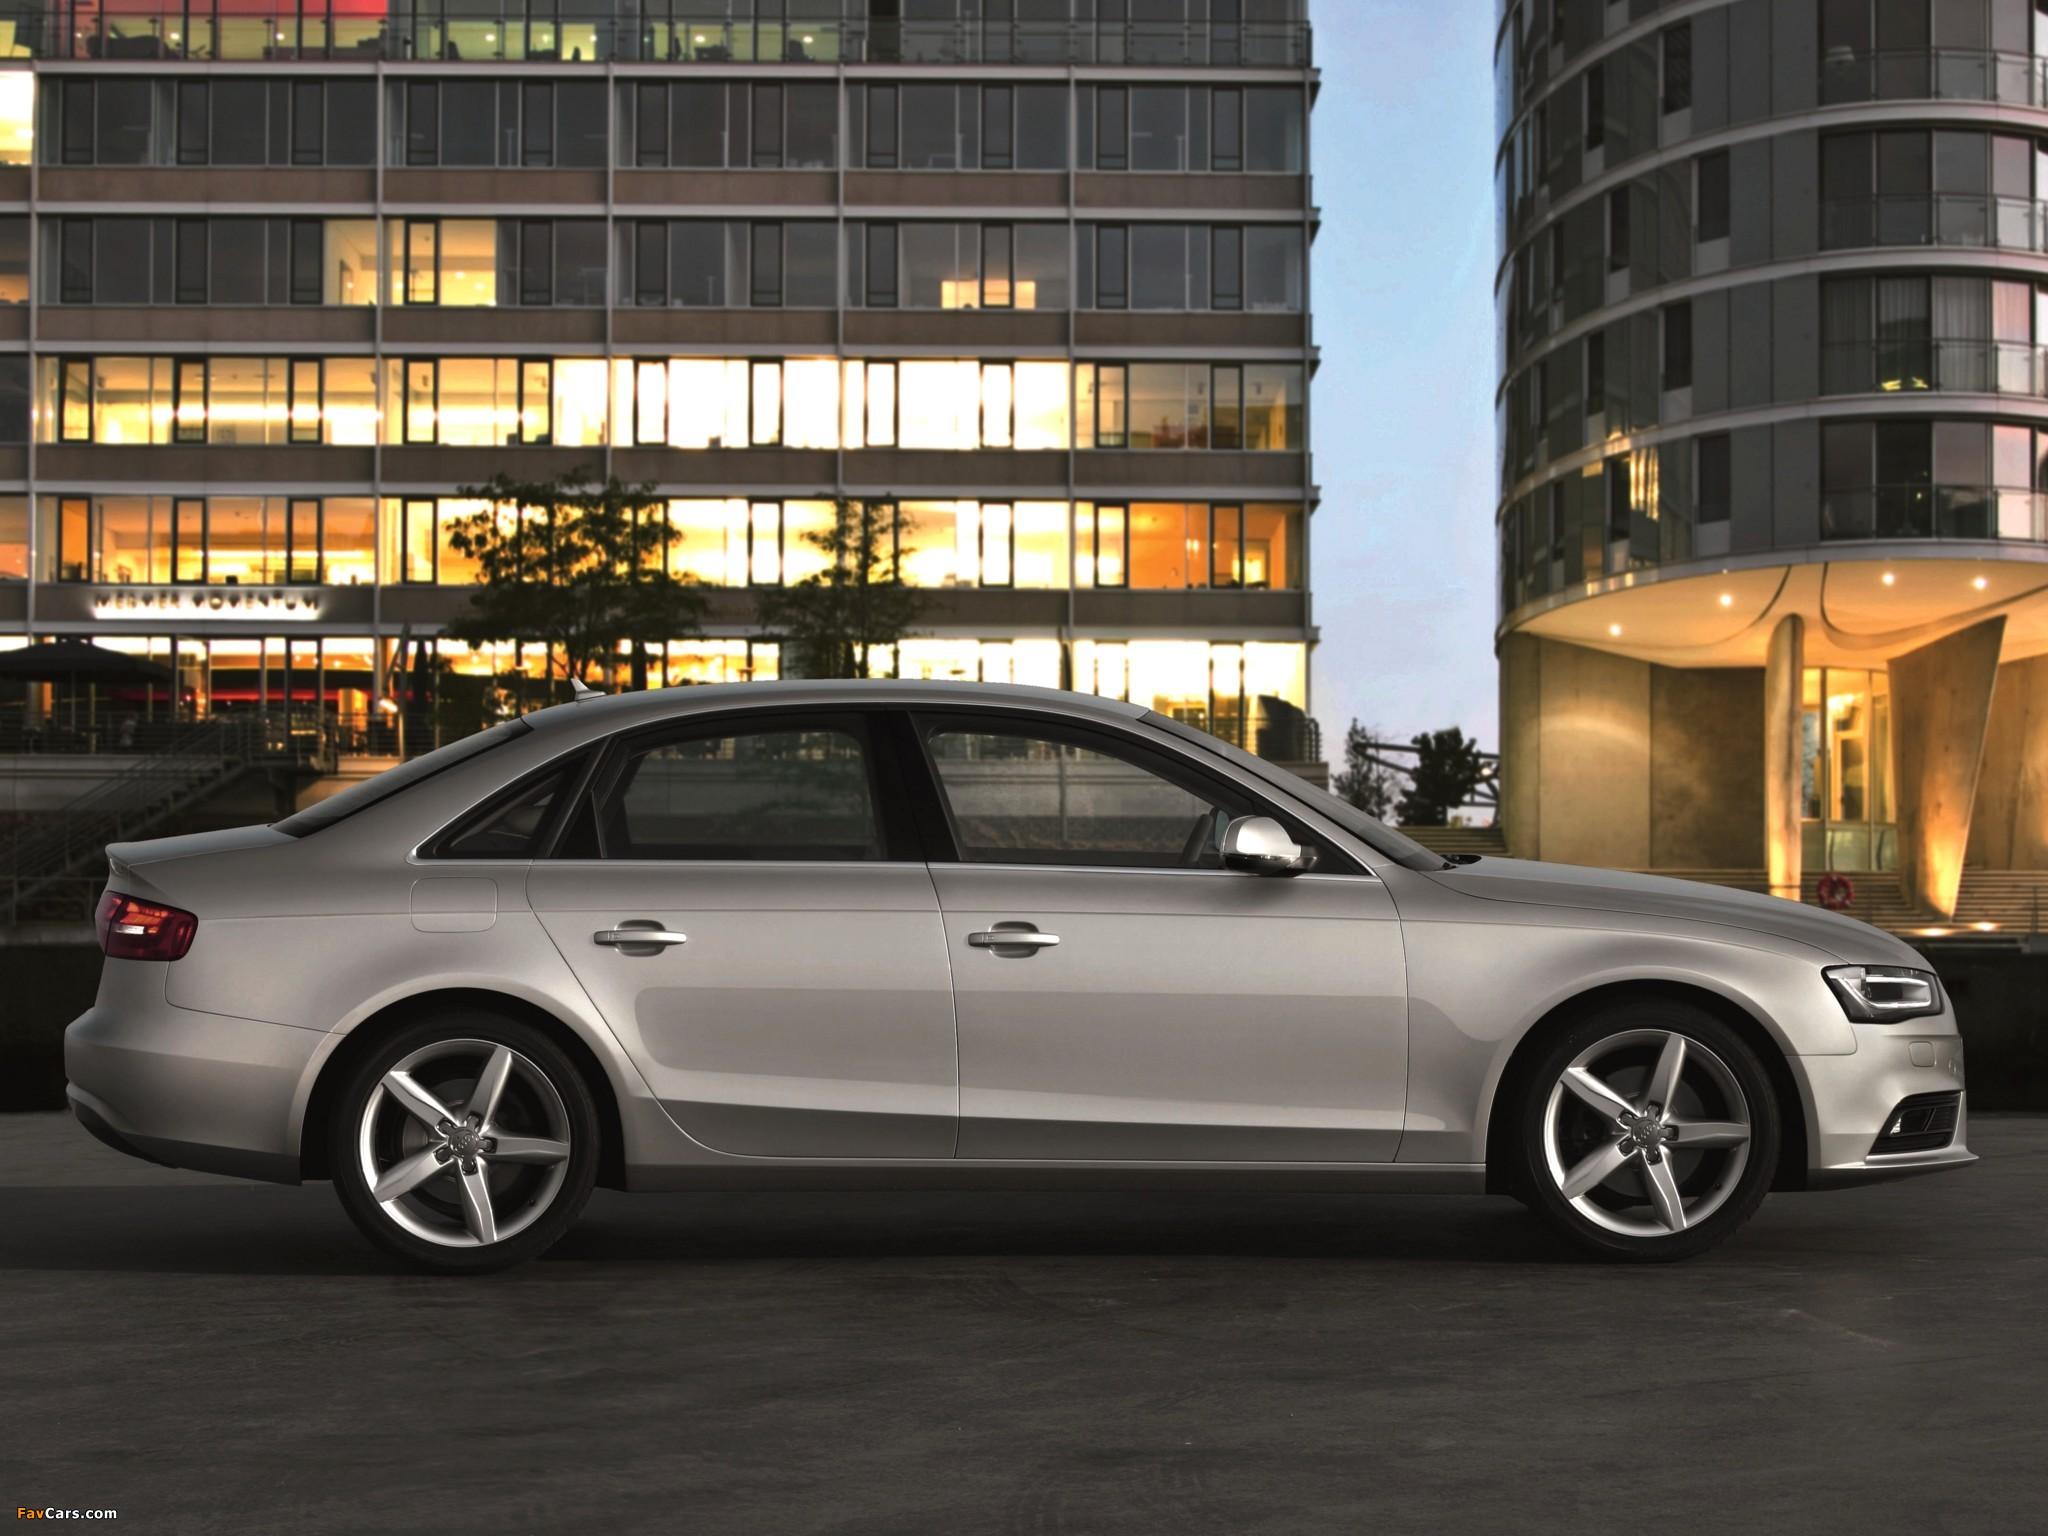 Photos Of Audi A4 2 0 Tfsi Sedan B8 8k 2012 2048x1536